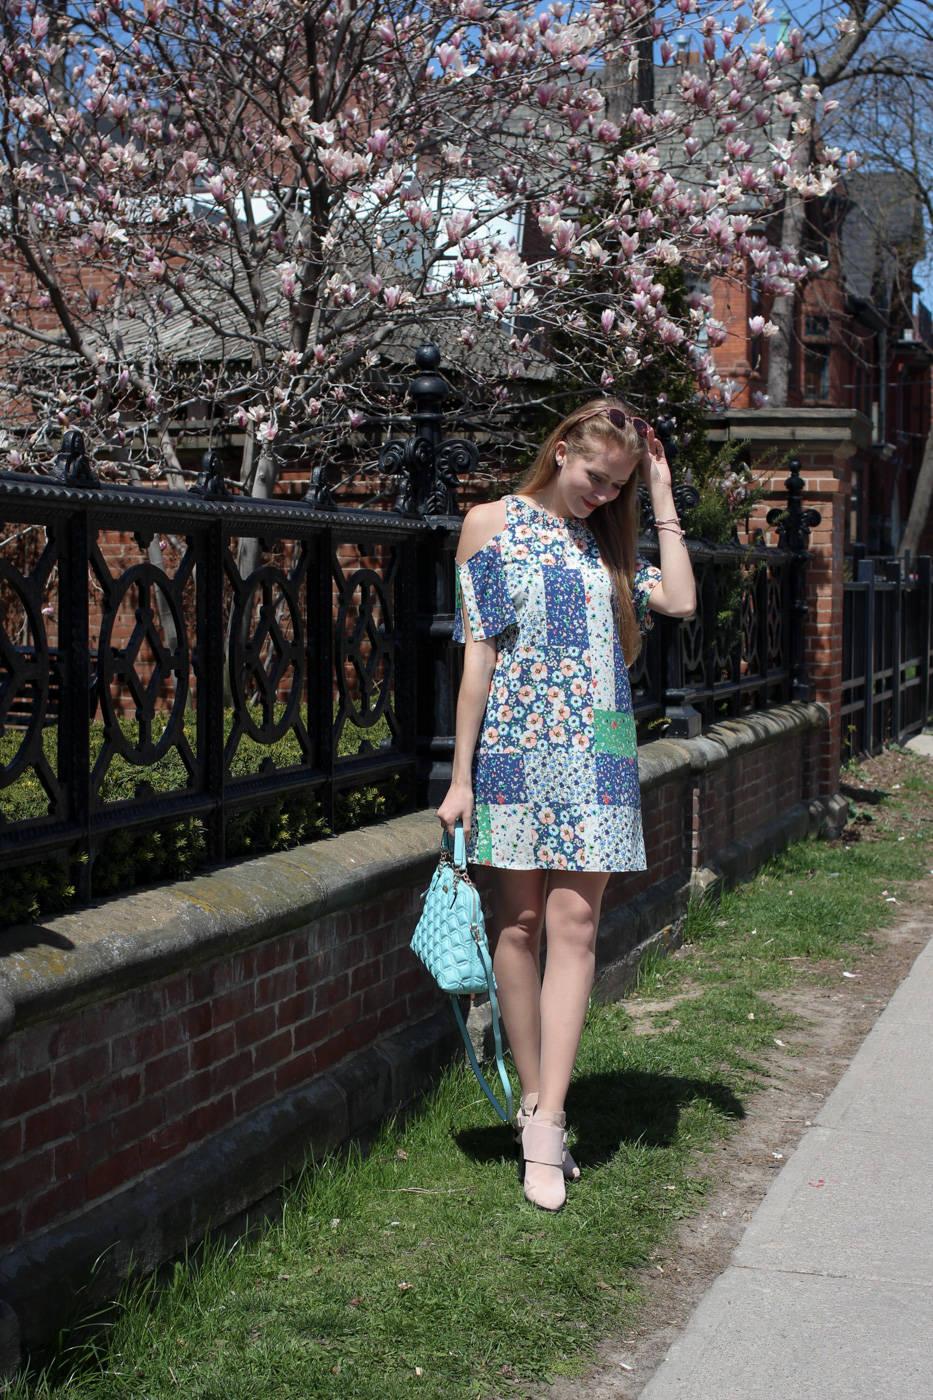 zara cherry blossom dress (6 of 14)